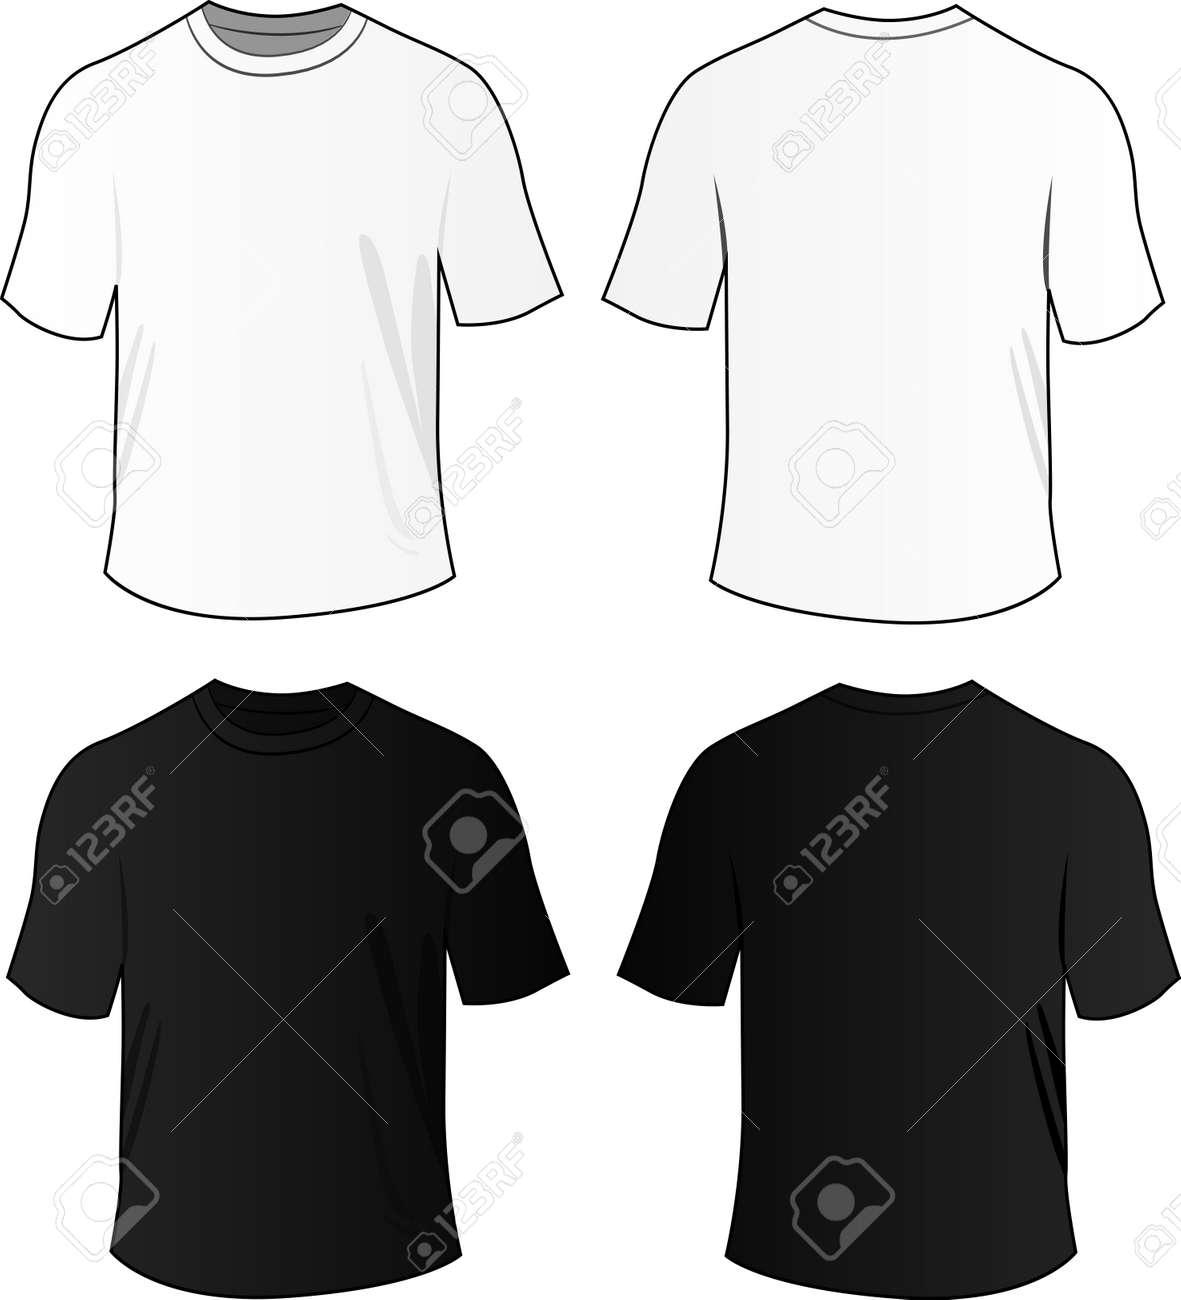 Black t shirt vector photoshop - Tshirt Vector Illustration Of Black And White Blank Tee Shirts